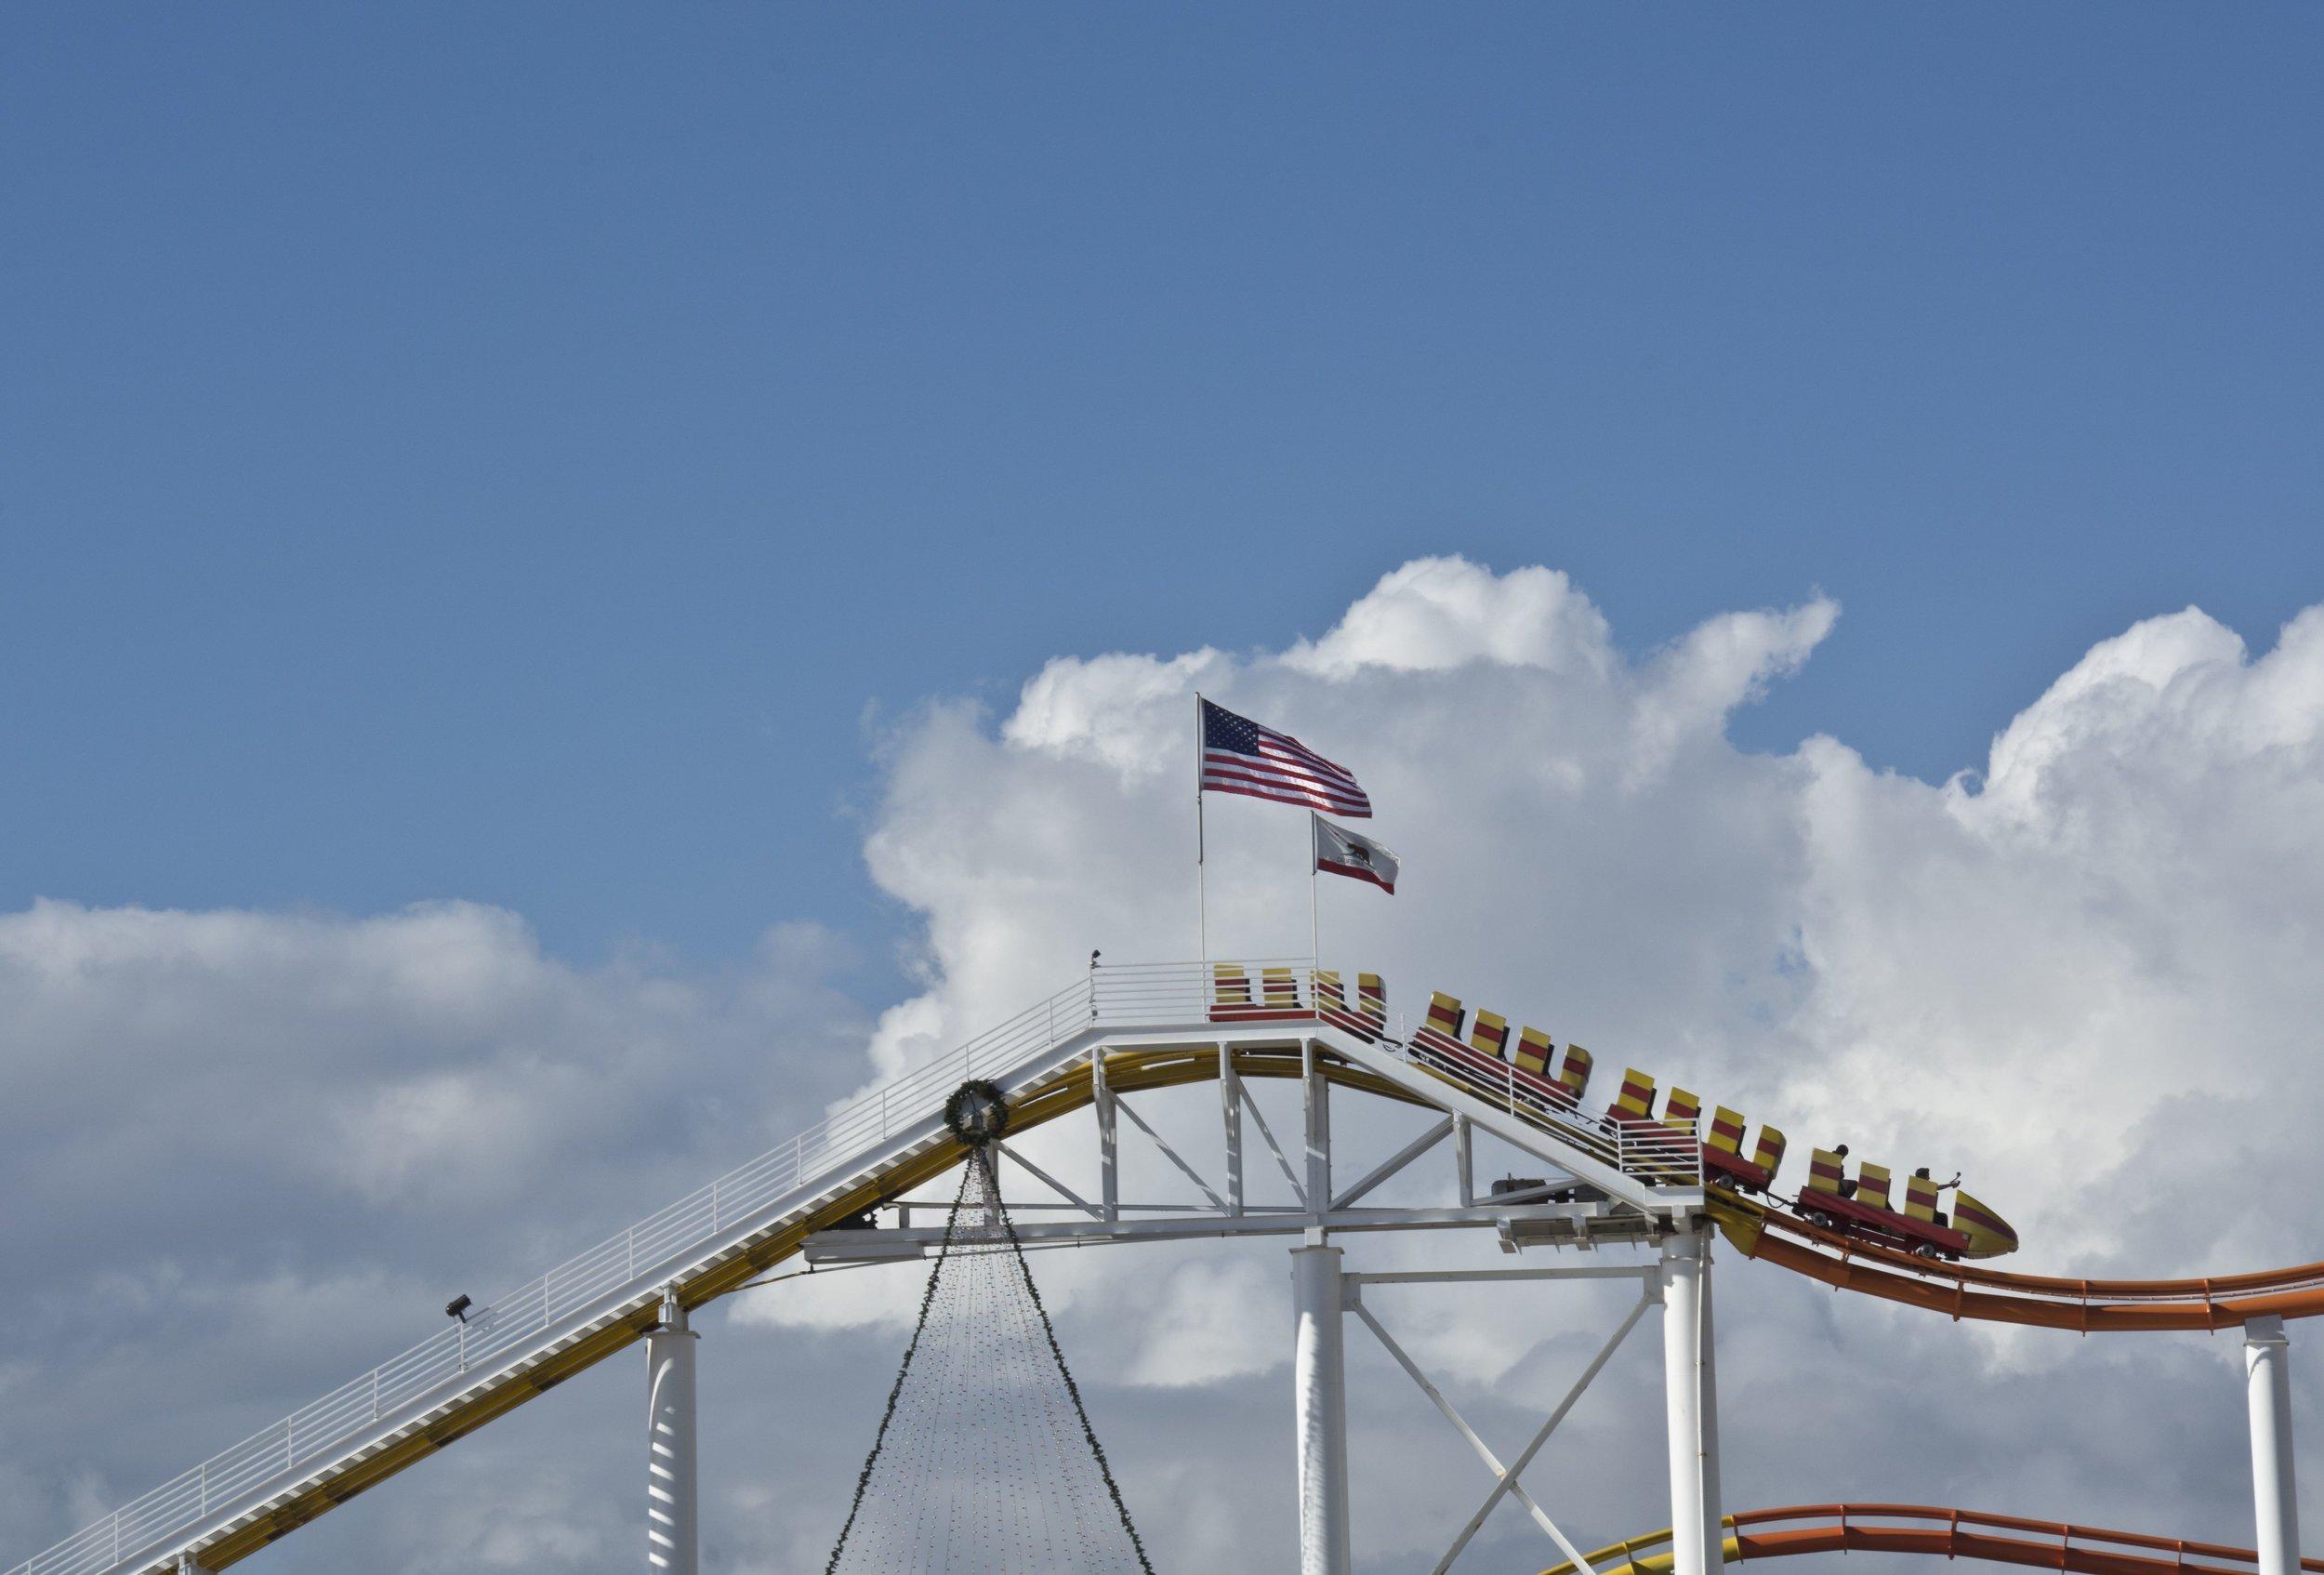 Roller coaster in Santa Monica